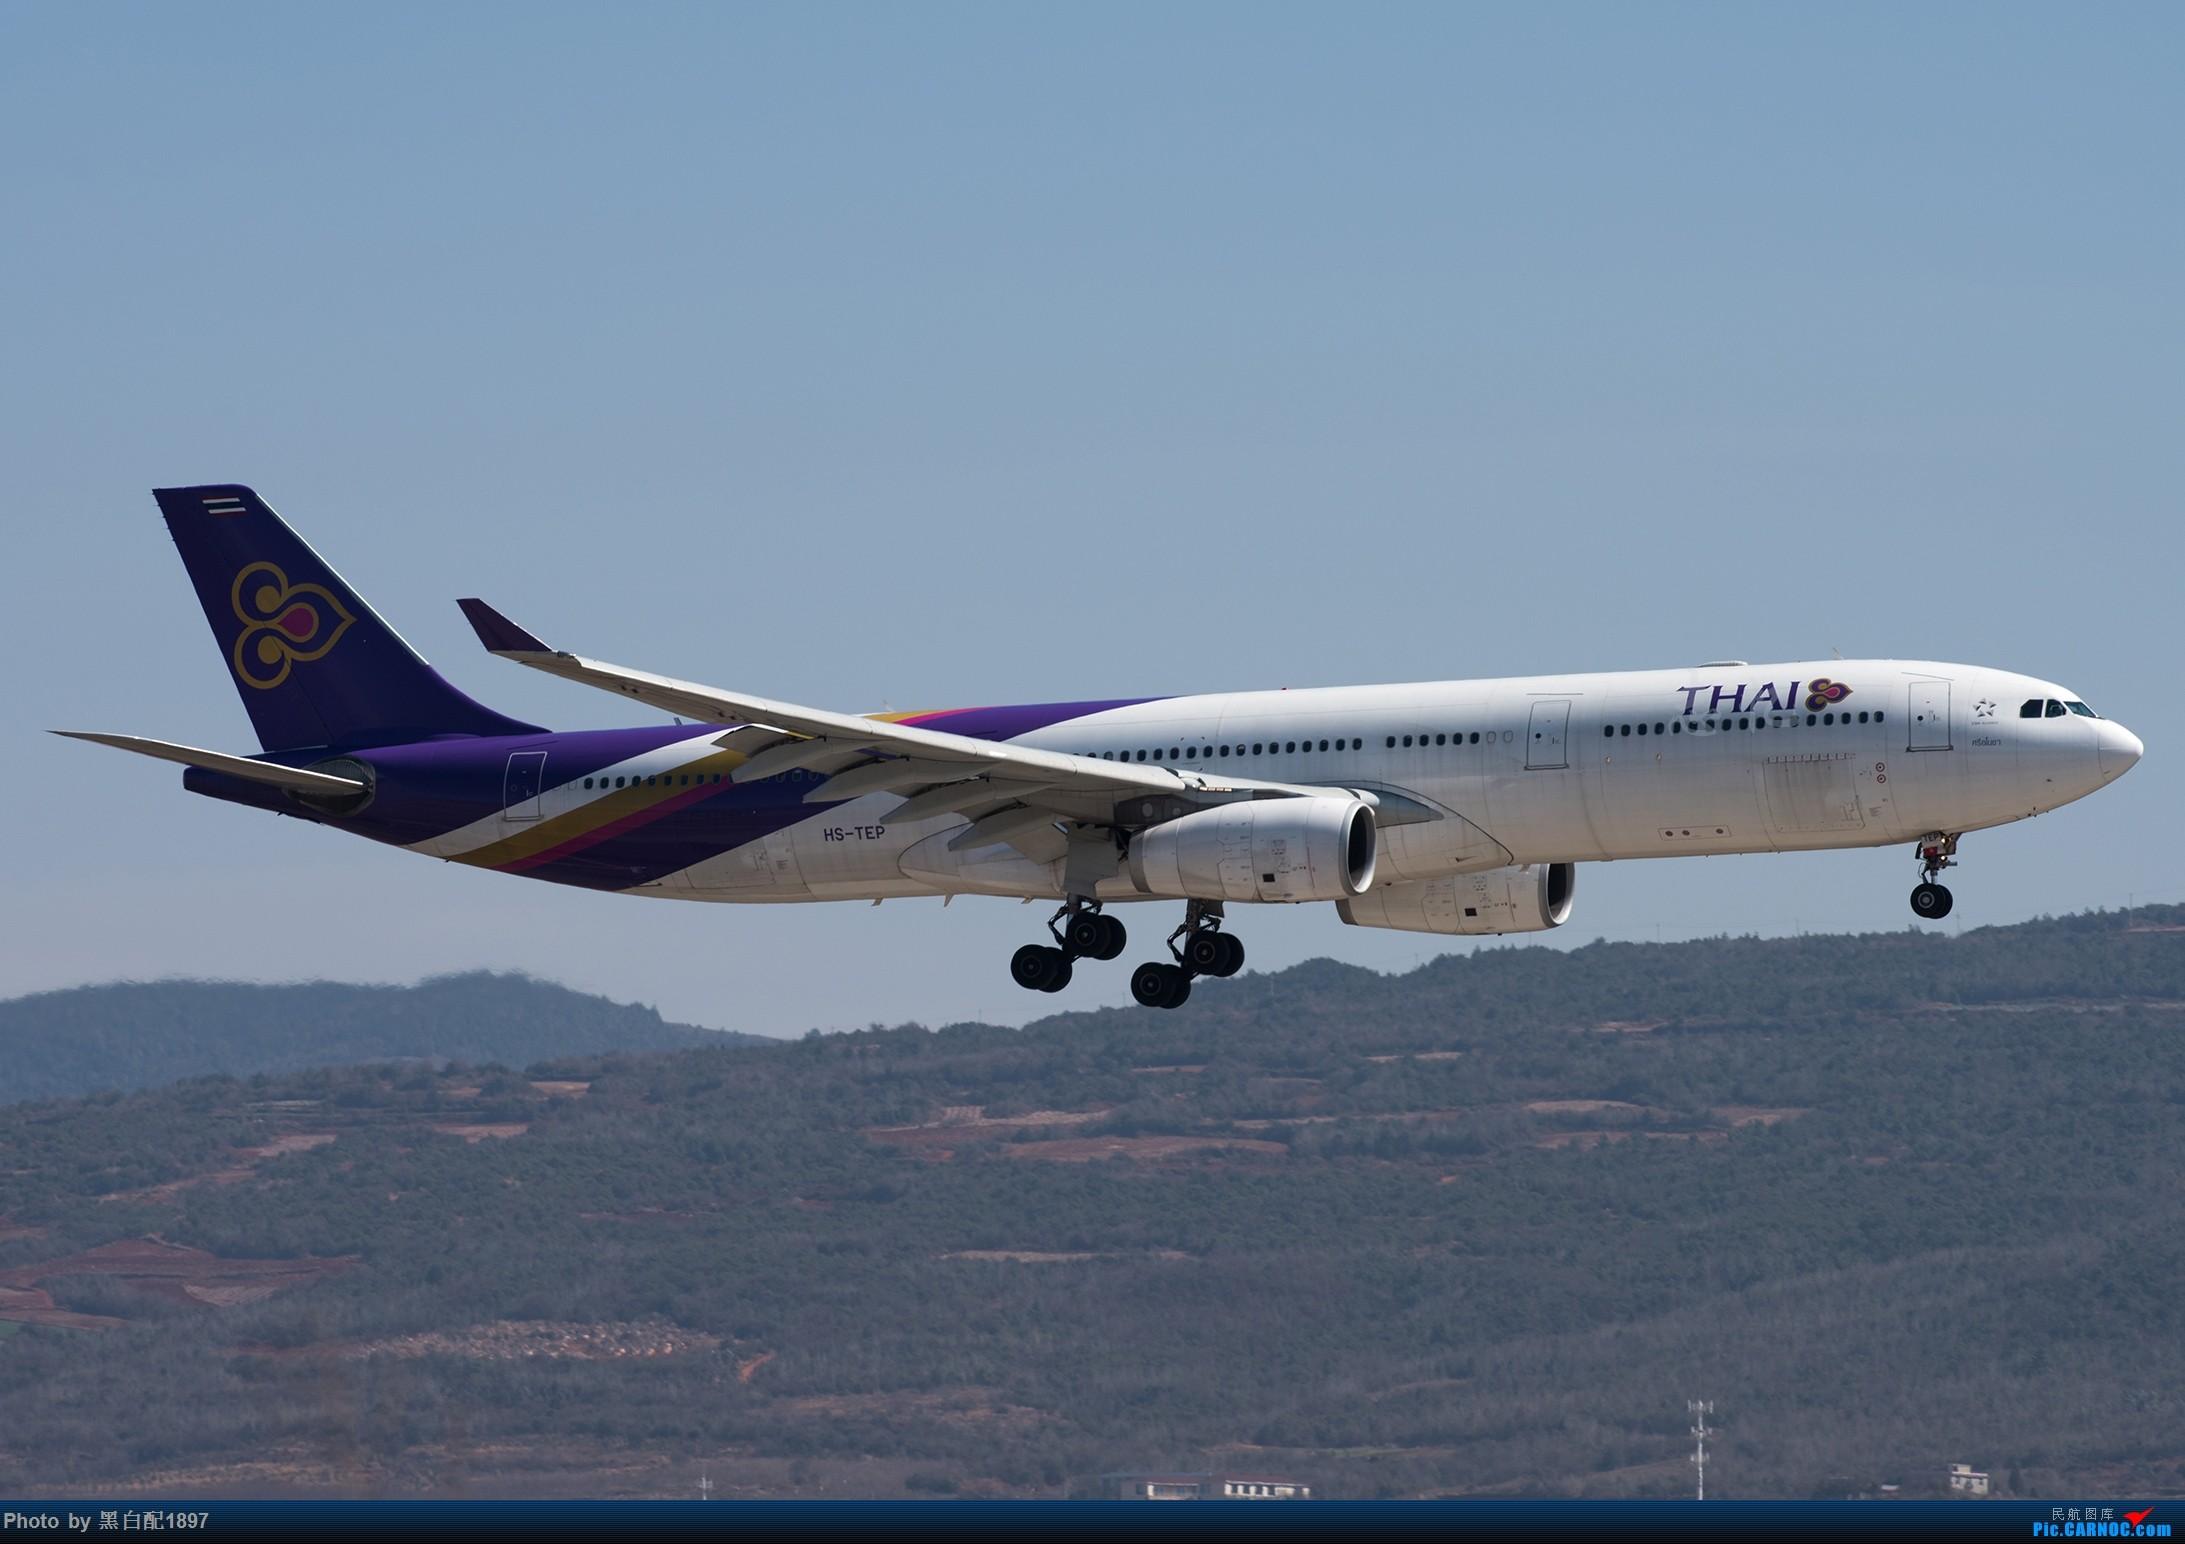 Re:鸡年收官图第二版 AIRBUS A330-300 HS-TEP 中国昆明长水国际机场